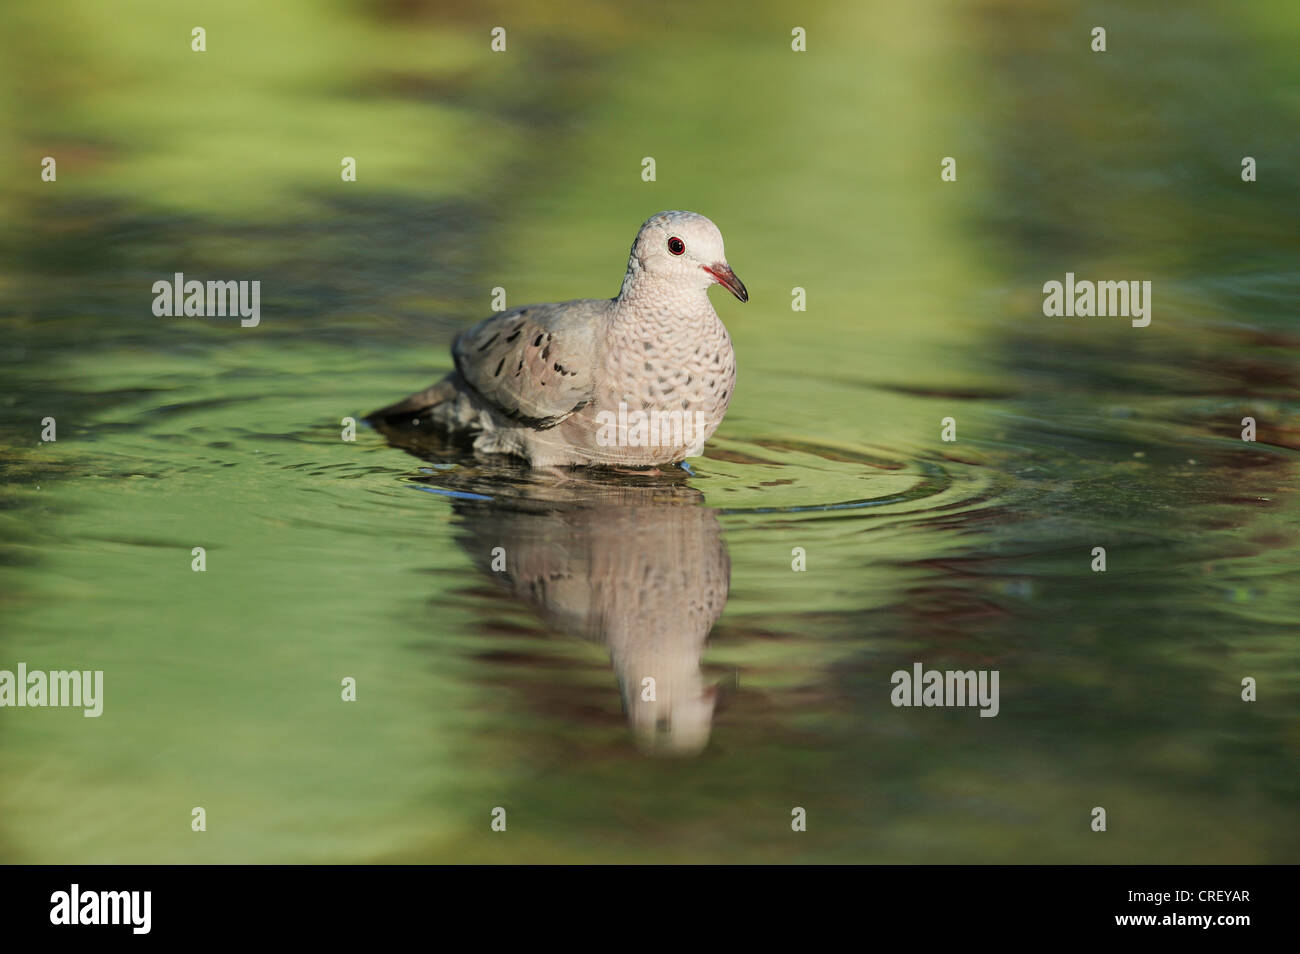 Common Ground-Dove (Columbina passerina), adult bathing, Dinero, Lake Corpus Christi, South Texas, USA Stock Photo